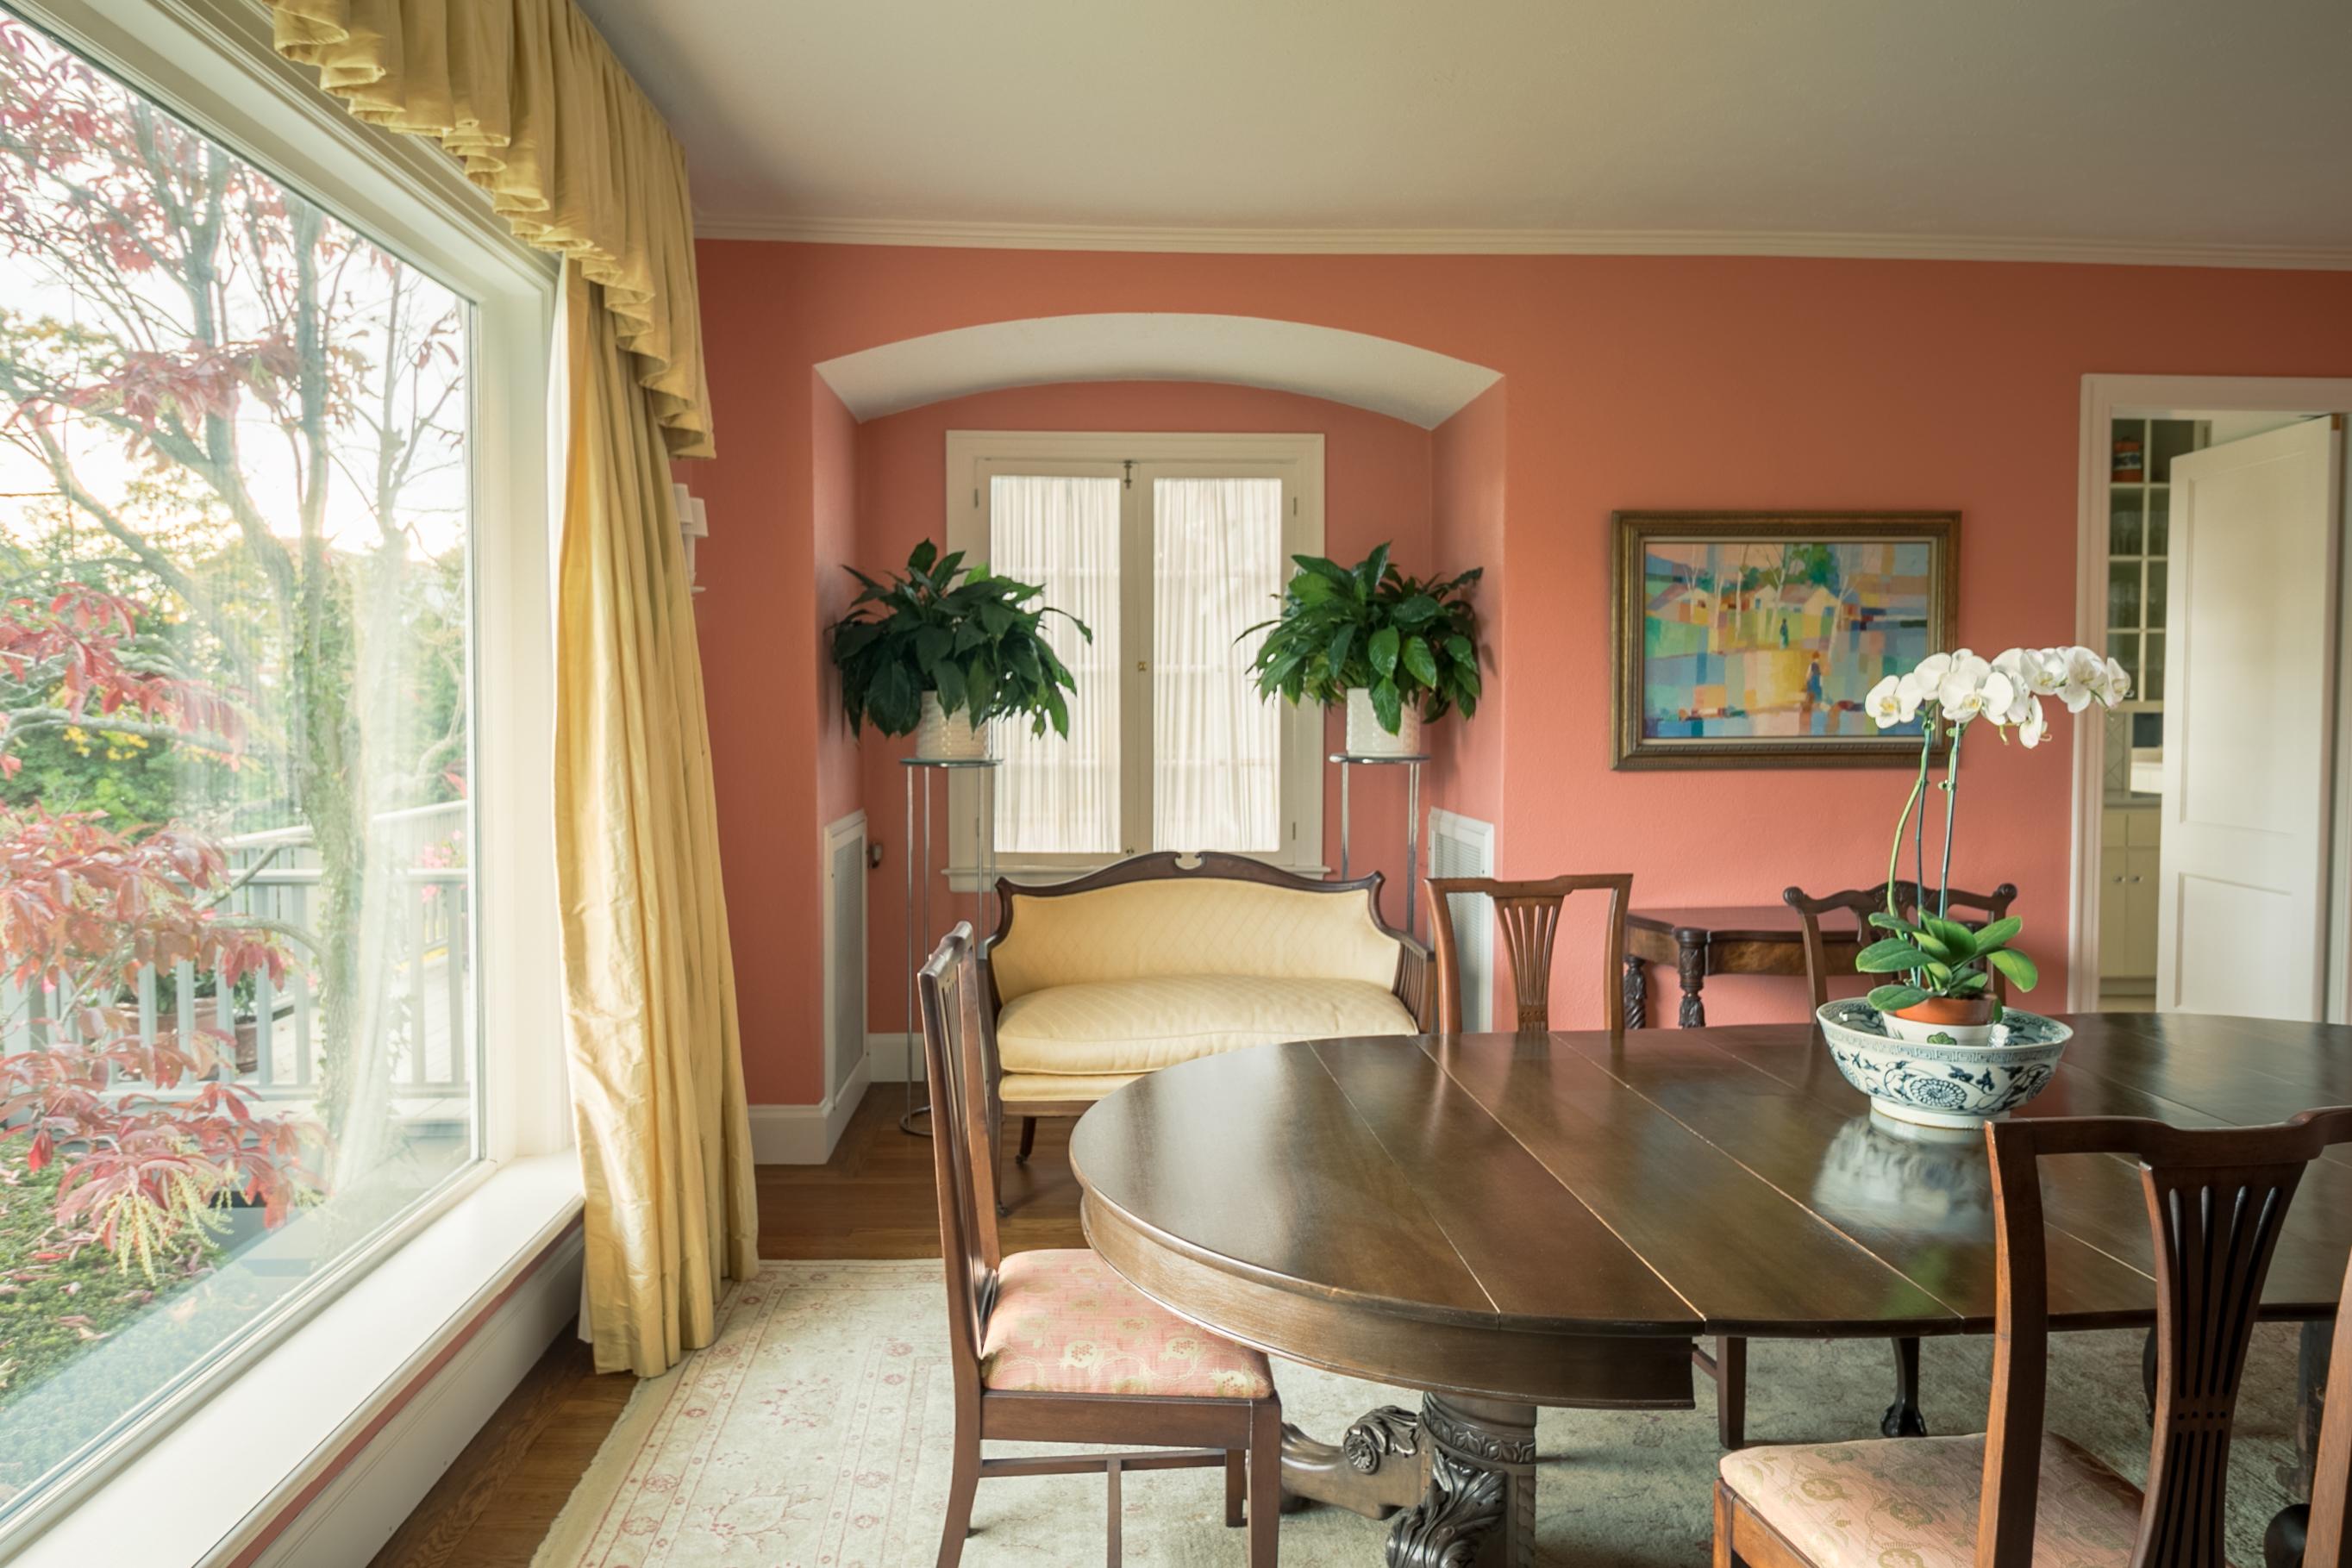 Additional photo for property listing at 129 Nayatt Rd, Barrington, RI  Barrington, Rhode Island 02806 United States